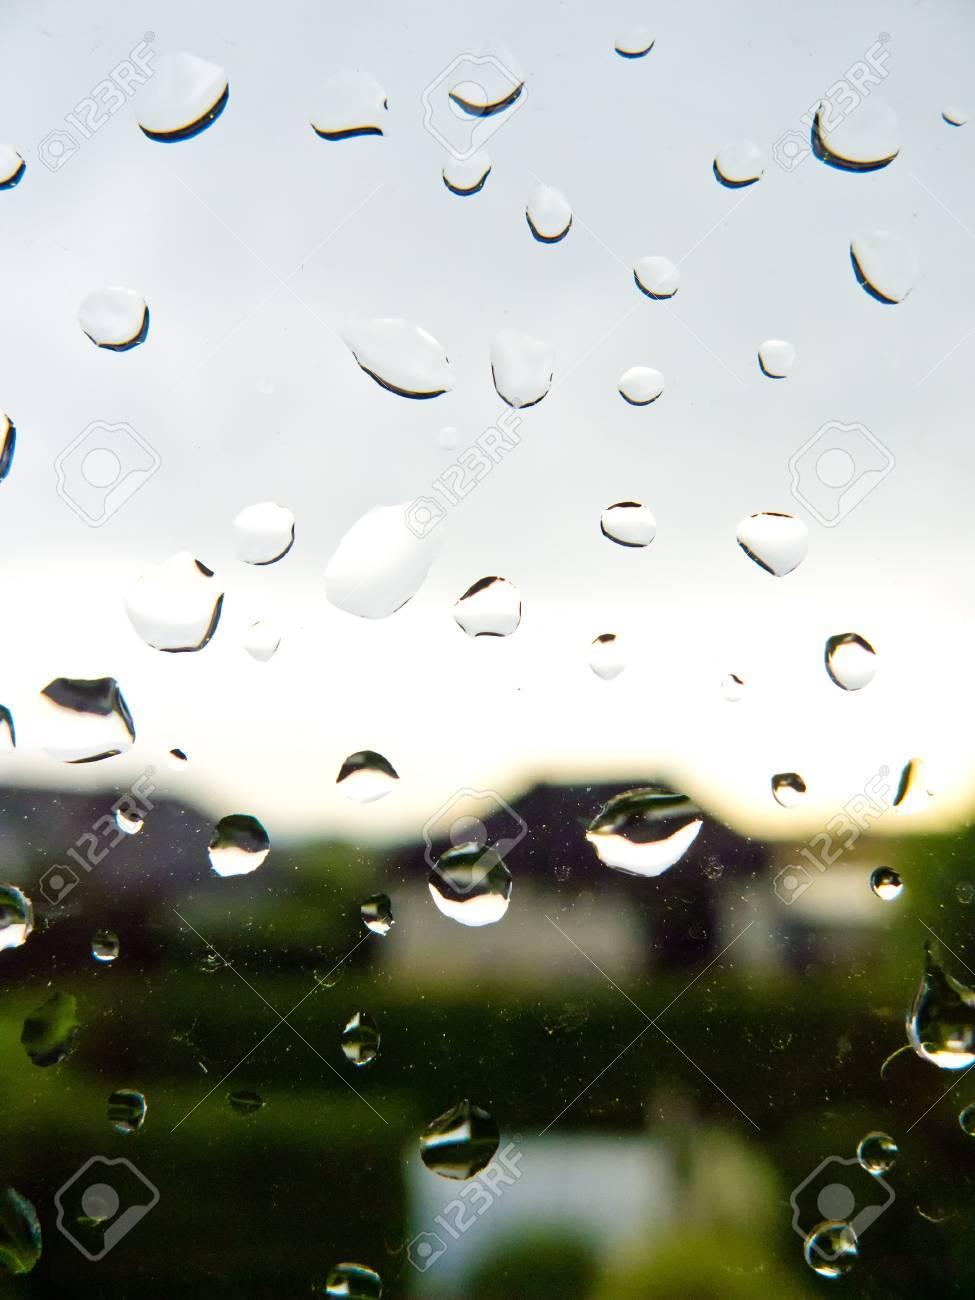 many rain drops during bad weather on a window pane  rainy weather Stock Photo - 14563467